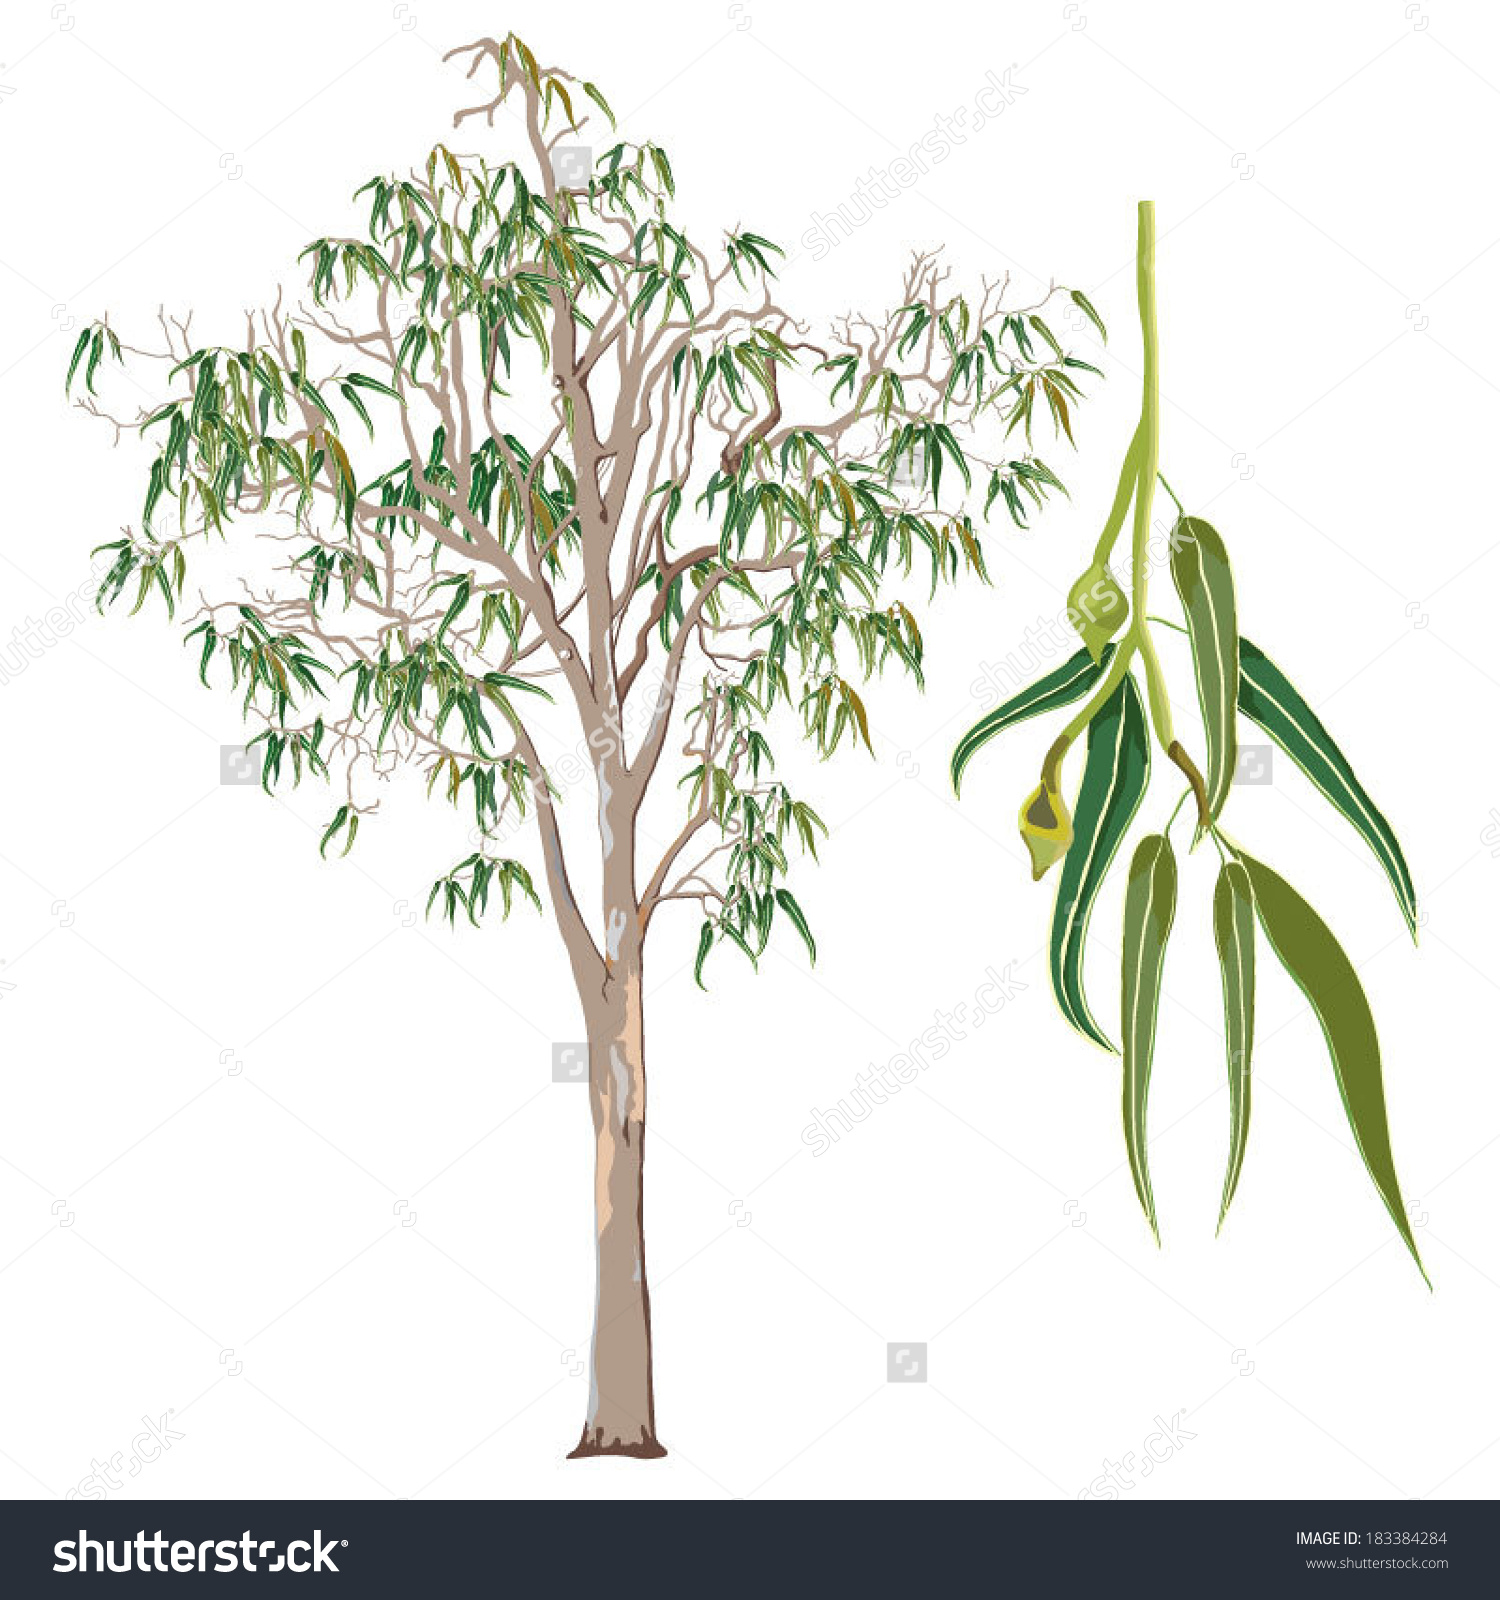 Eucalyptus Gum Tree clipart #15, Download drawings